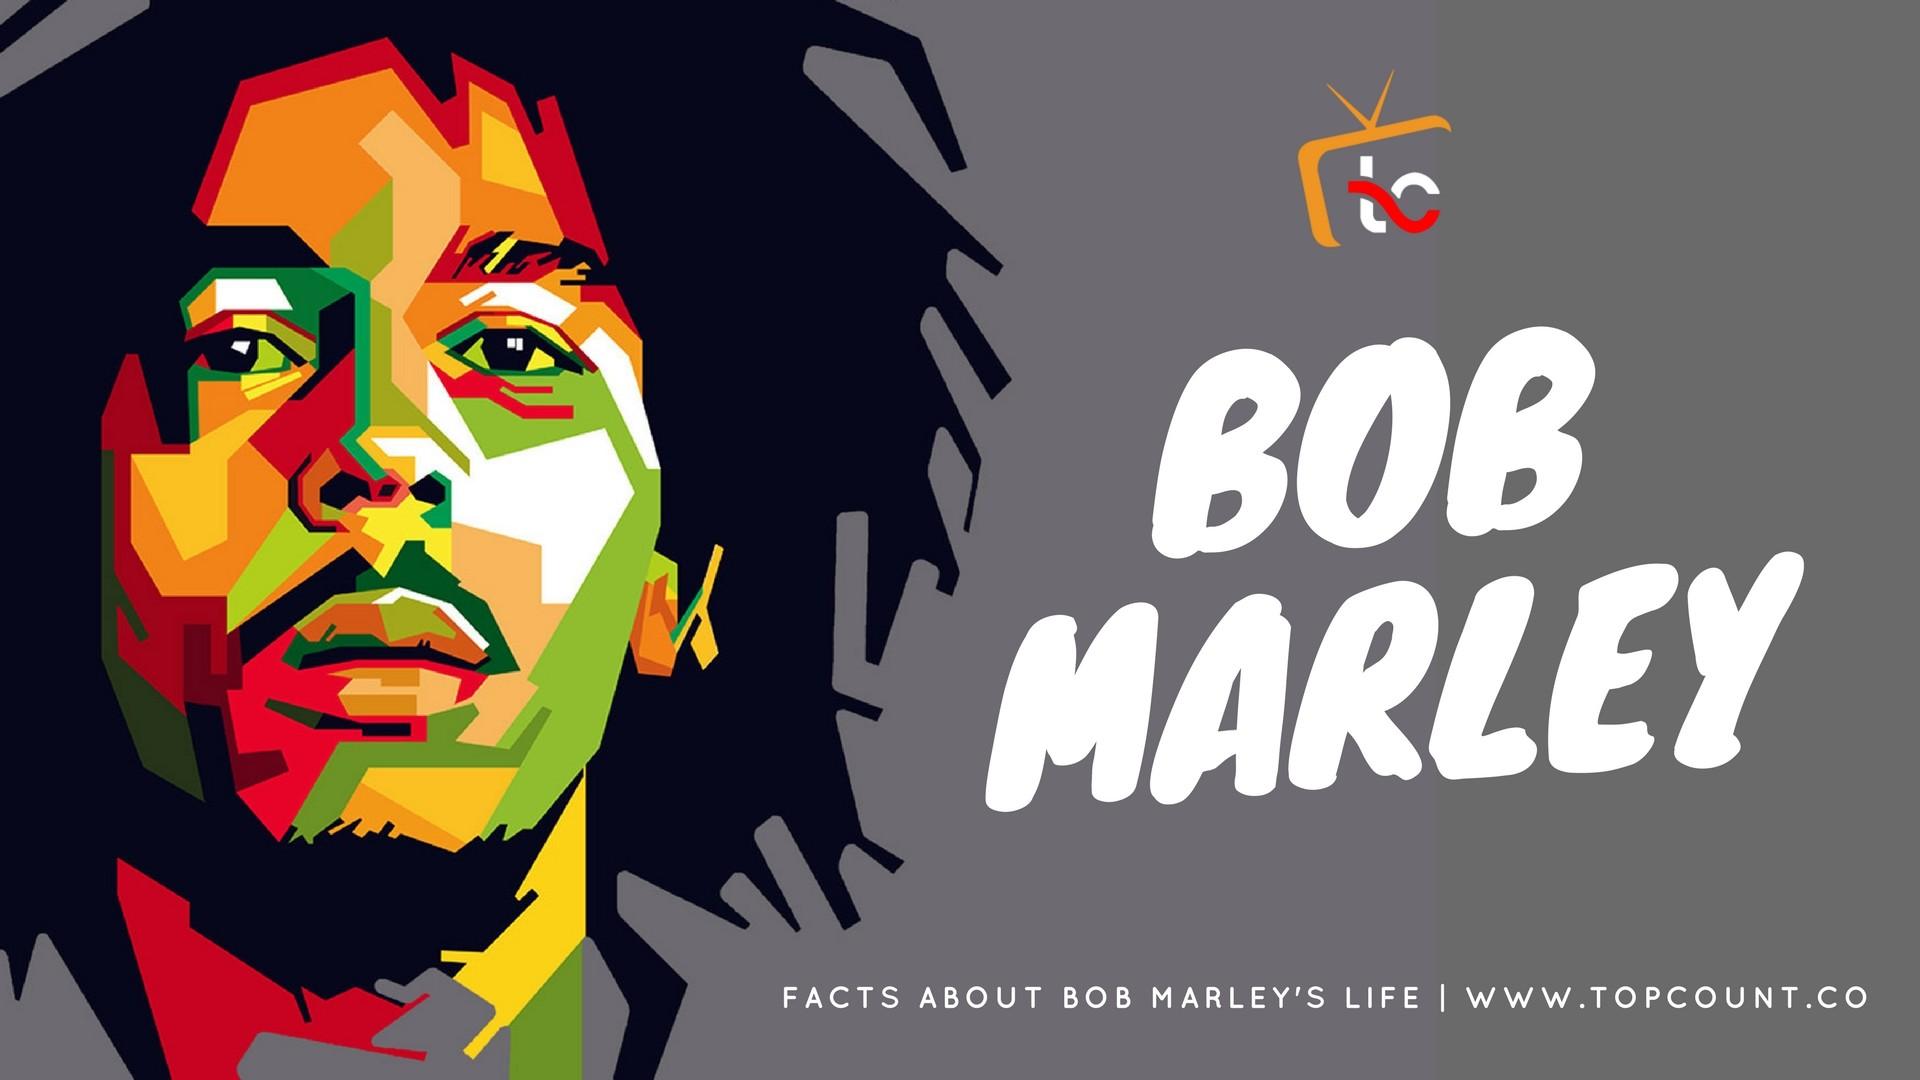 Bob Marley Quotes Wallpaper 74 Images